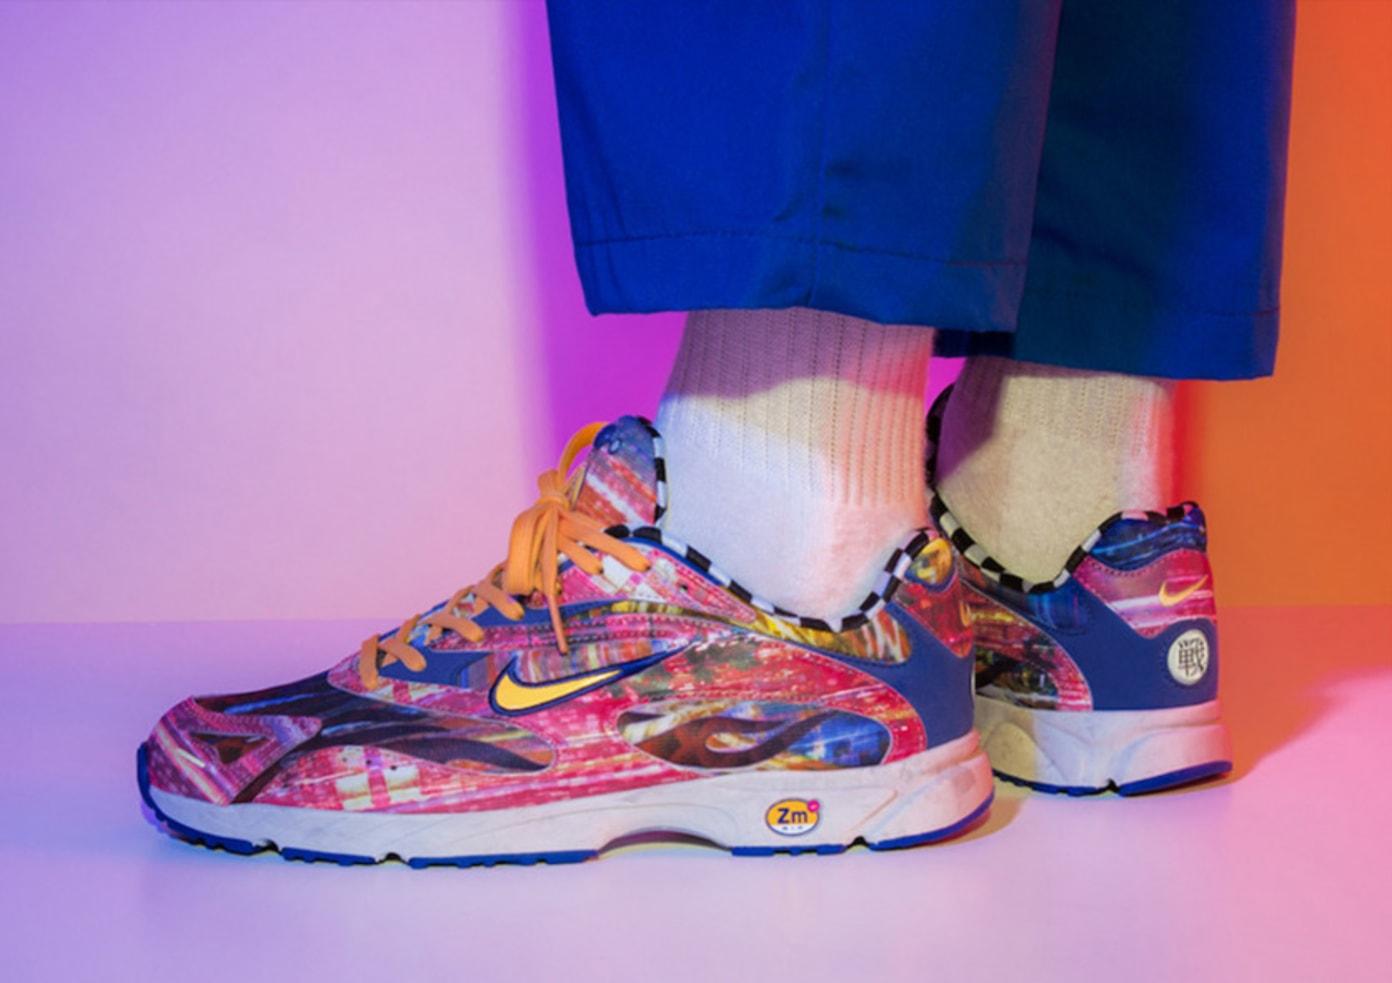 The Nike Zoom Spectrum Plus Premium | Two New Colourways